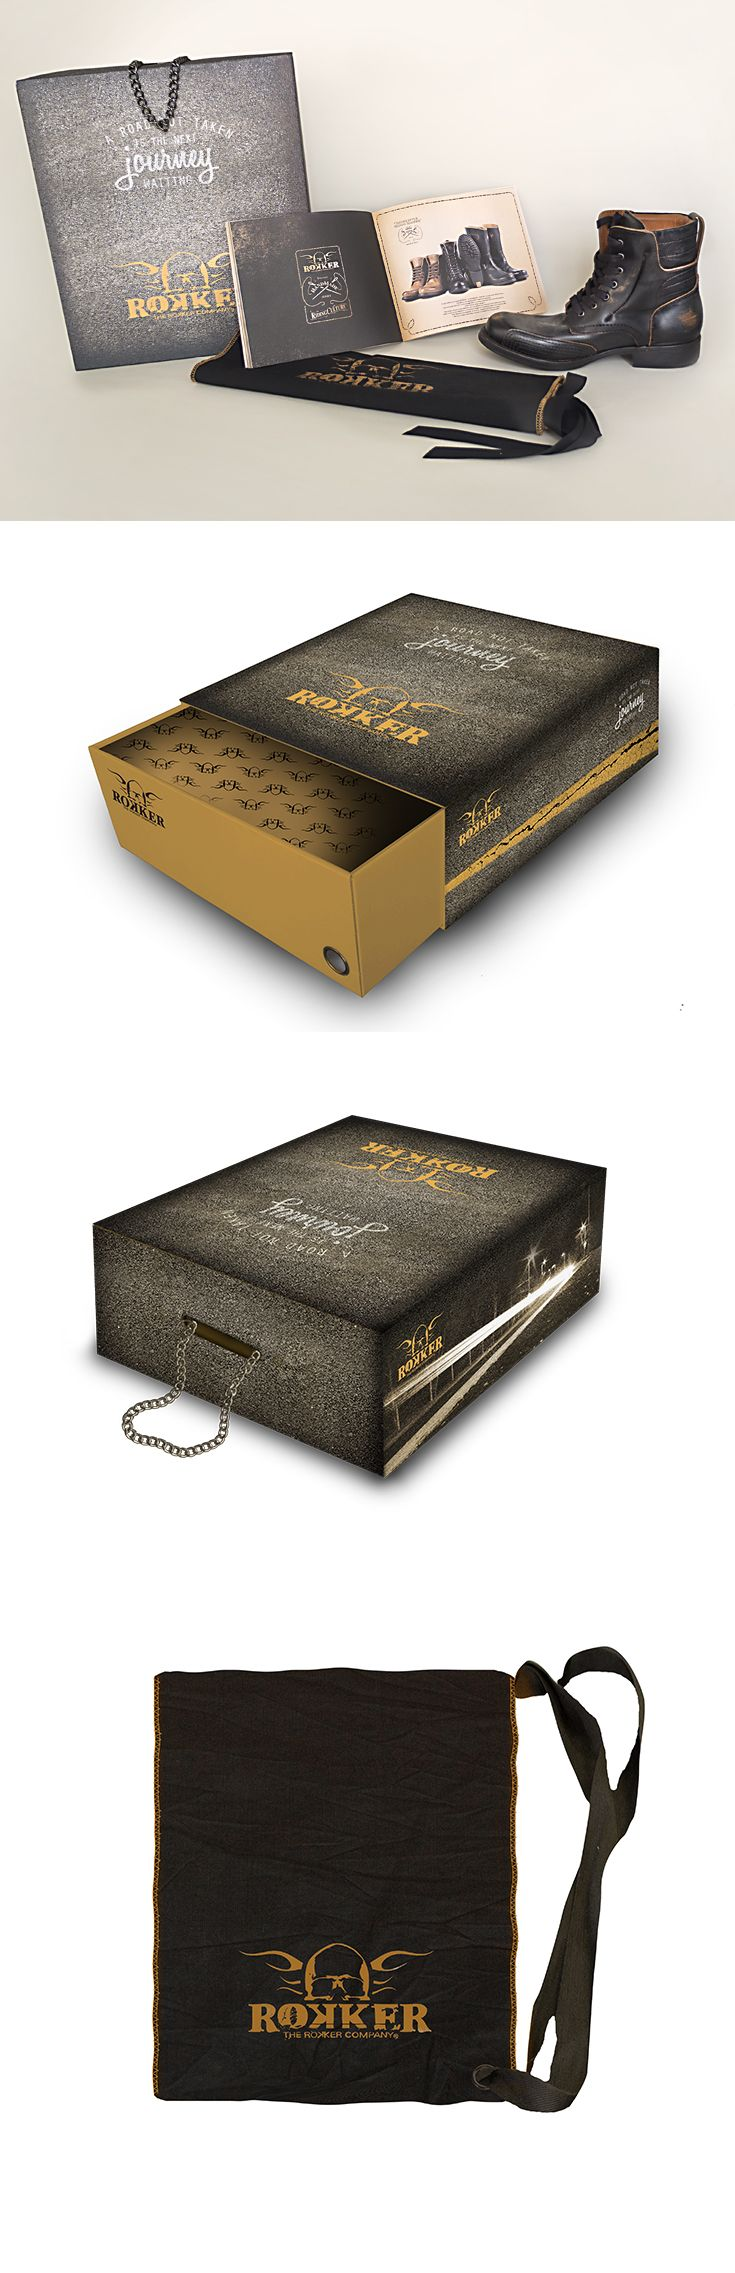 Scatola da scarpe per Rokker, un progetto #effADV - Rokker shoe box, effADV project - #packaging